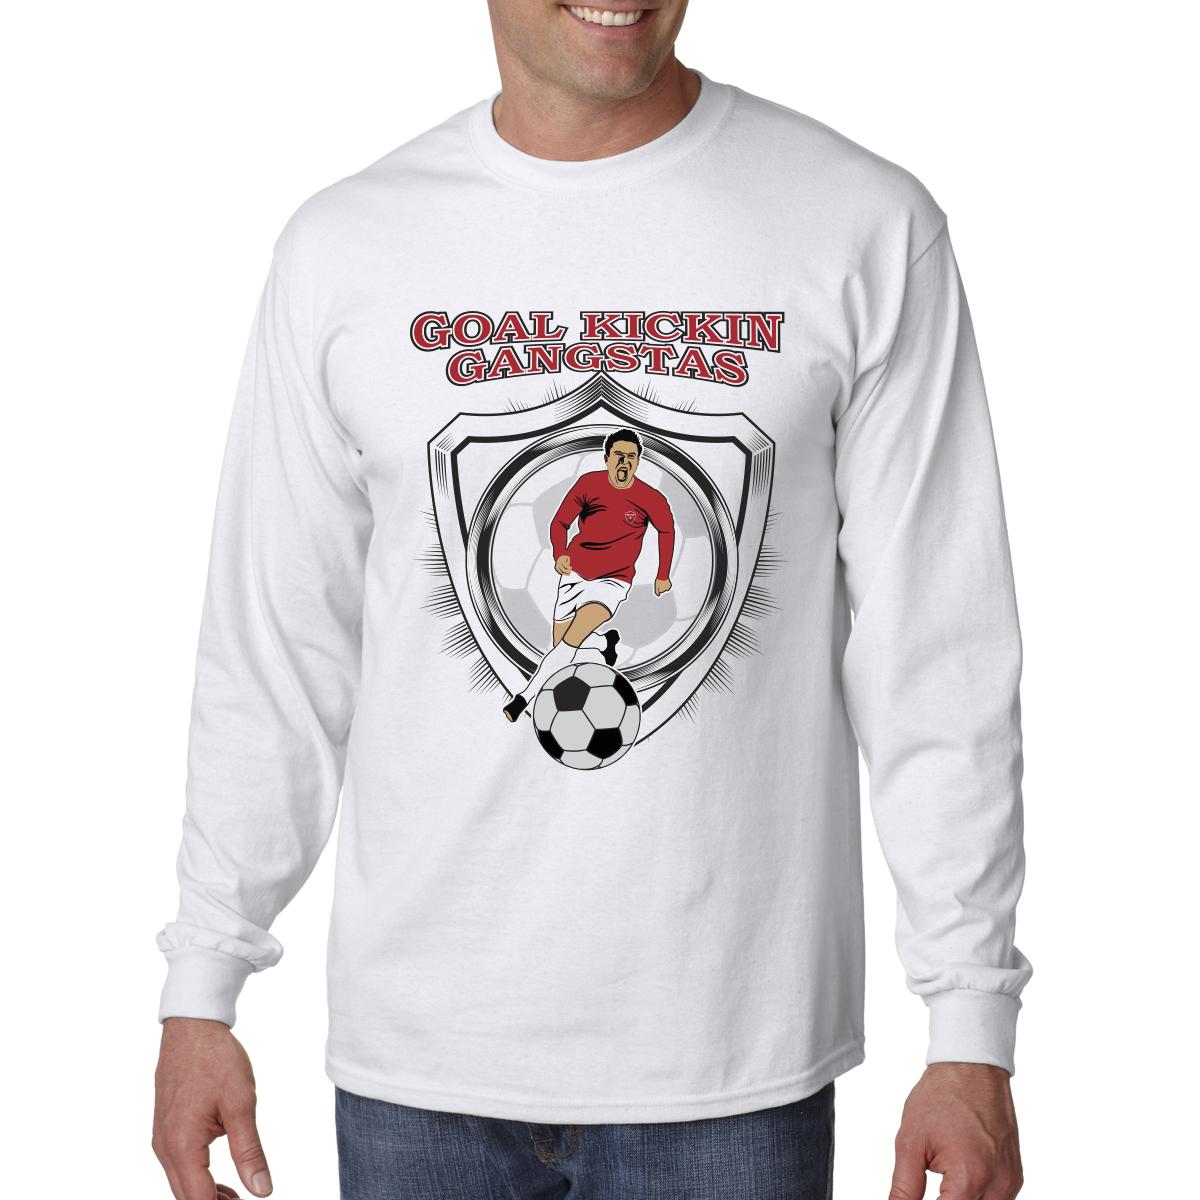 t shirt design by jaden ranen for 8 9 yr old boys soccer t - Soccer T Shirt Design Ideas